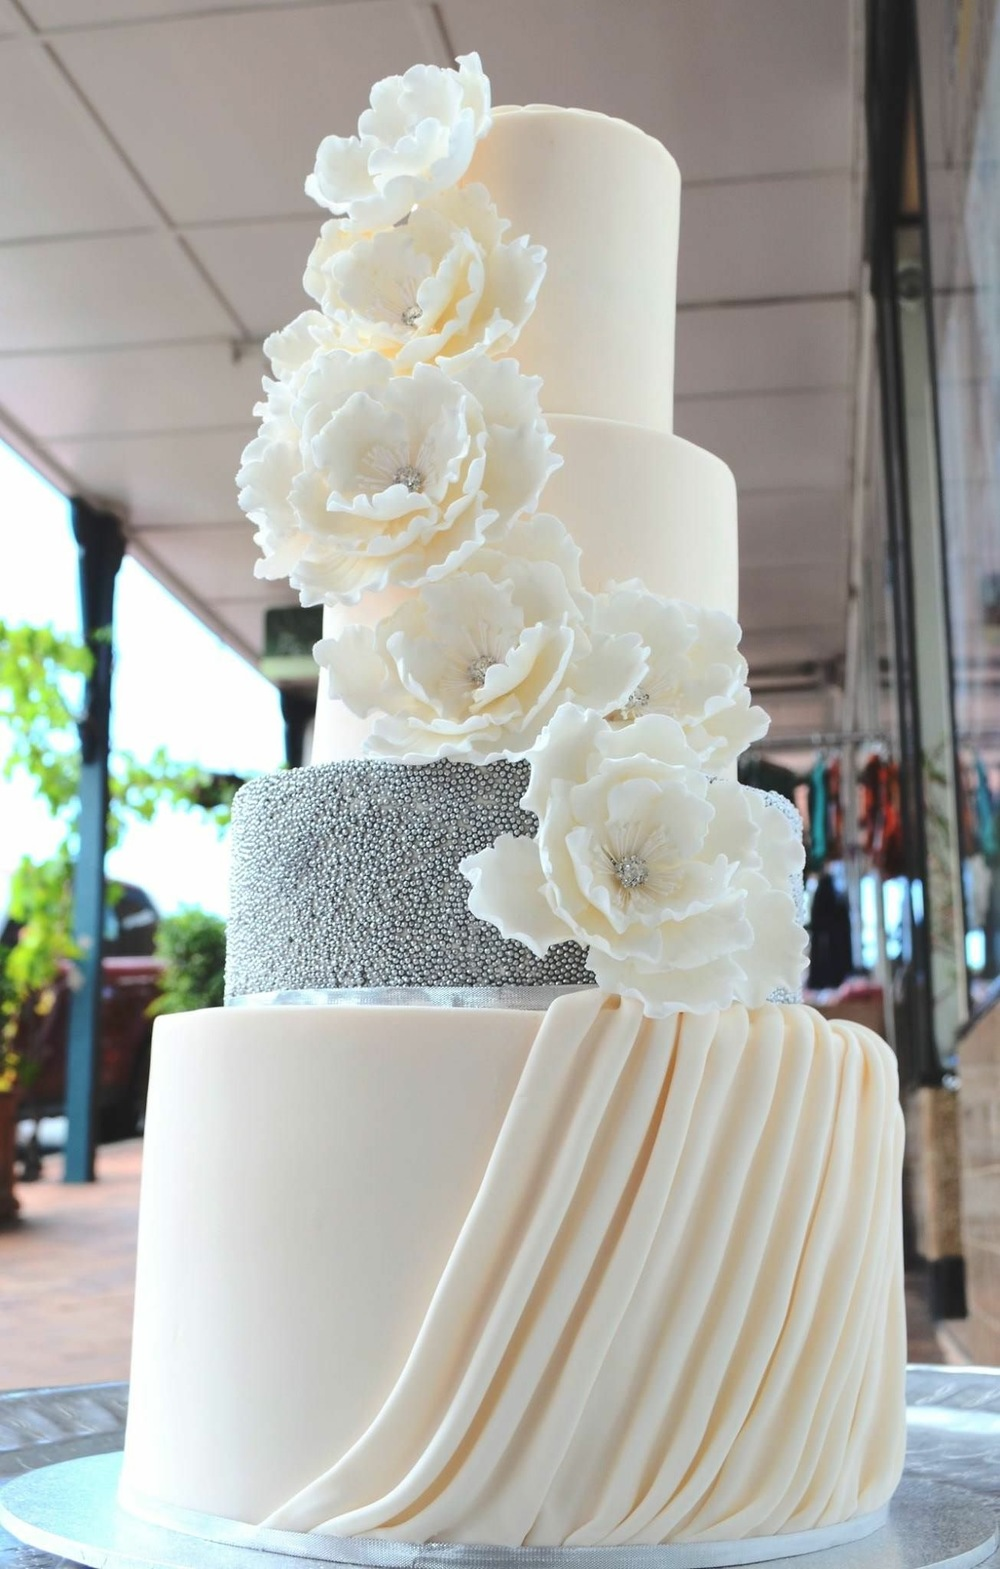 5 tier fondant wedding cake by Vanilla Pod Brisbane.JPG